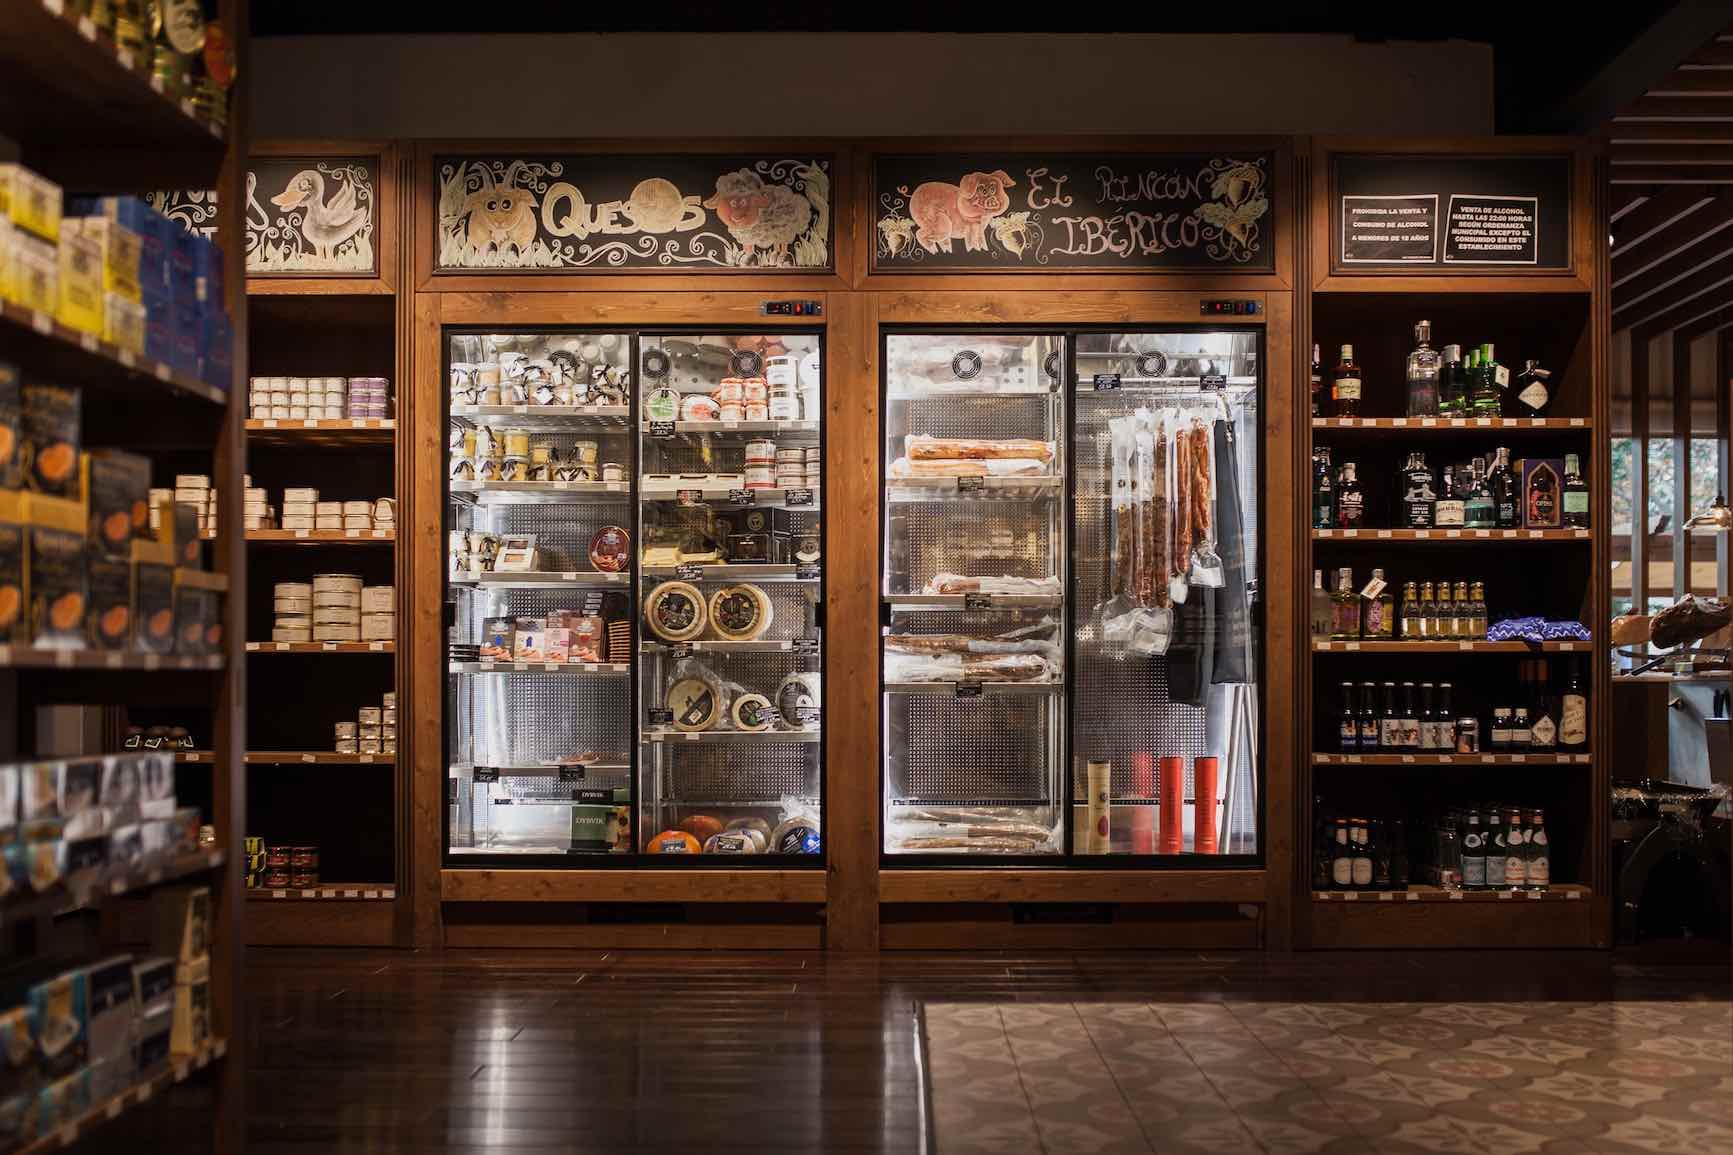 Mejores Tiendas Gourmet en Madrid